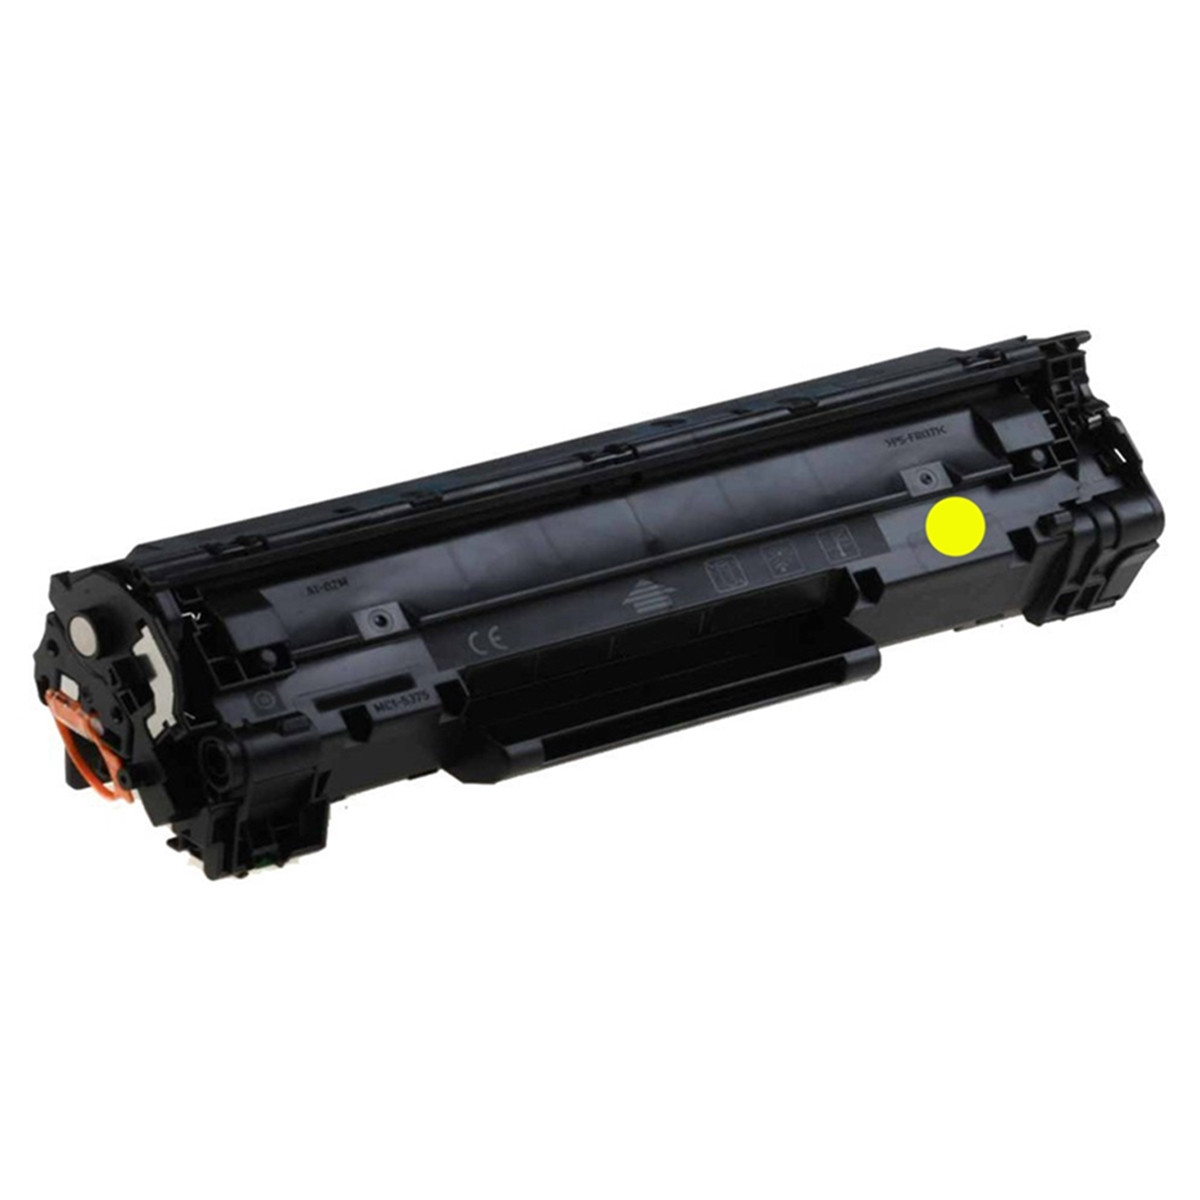 Toner Compatível HP CF402X 201X CF402XB Amarelo | M252 M277 M252DW M277DW | Importado 2.3k